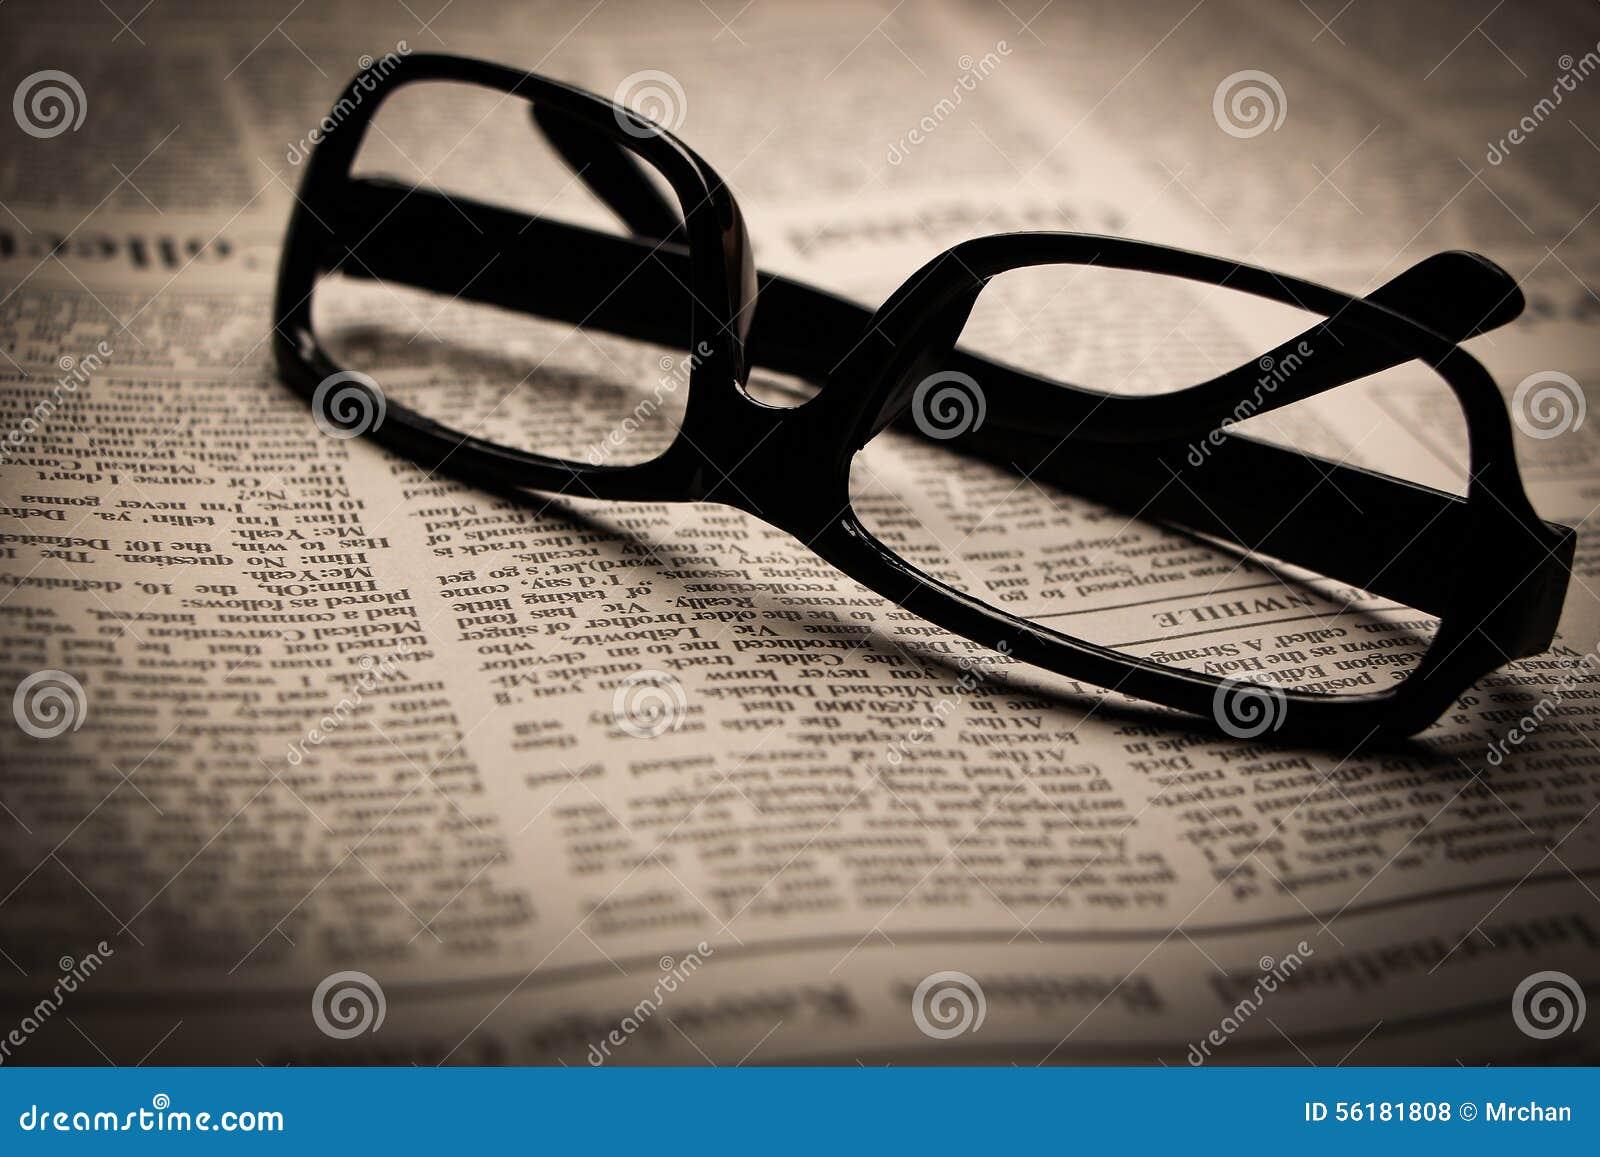 Glazen op krant